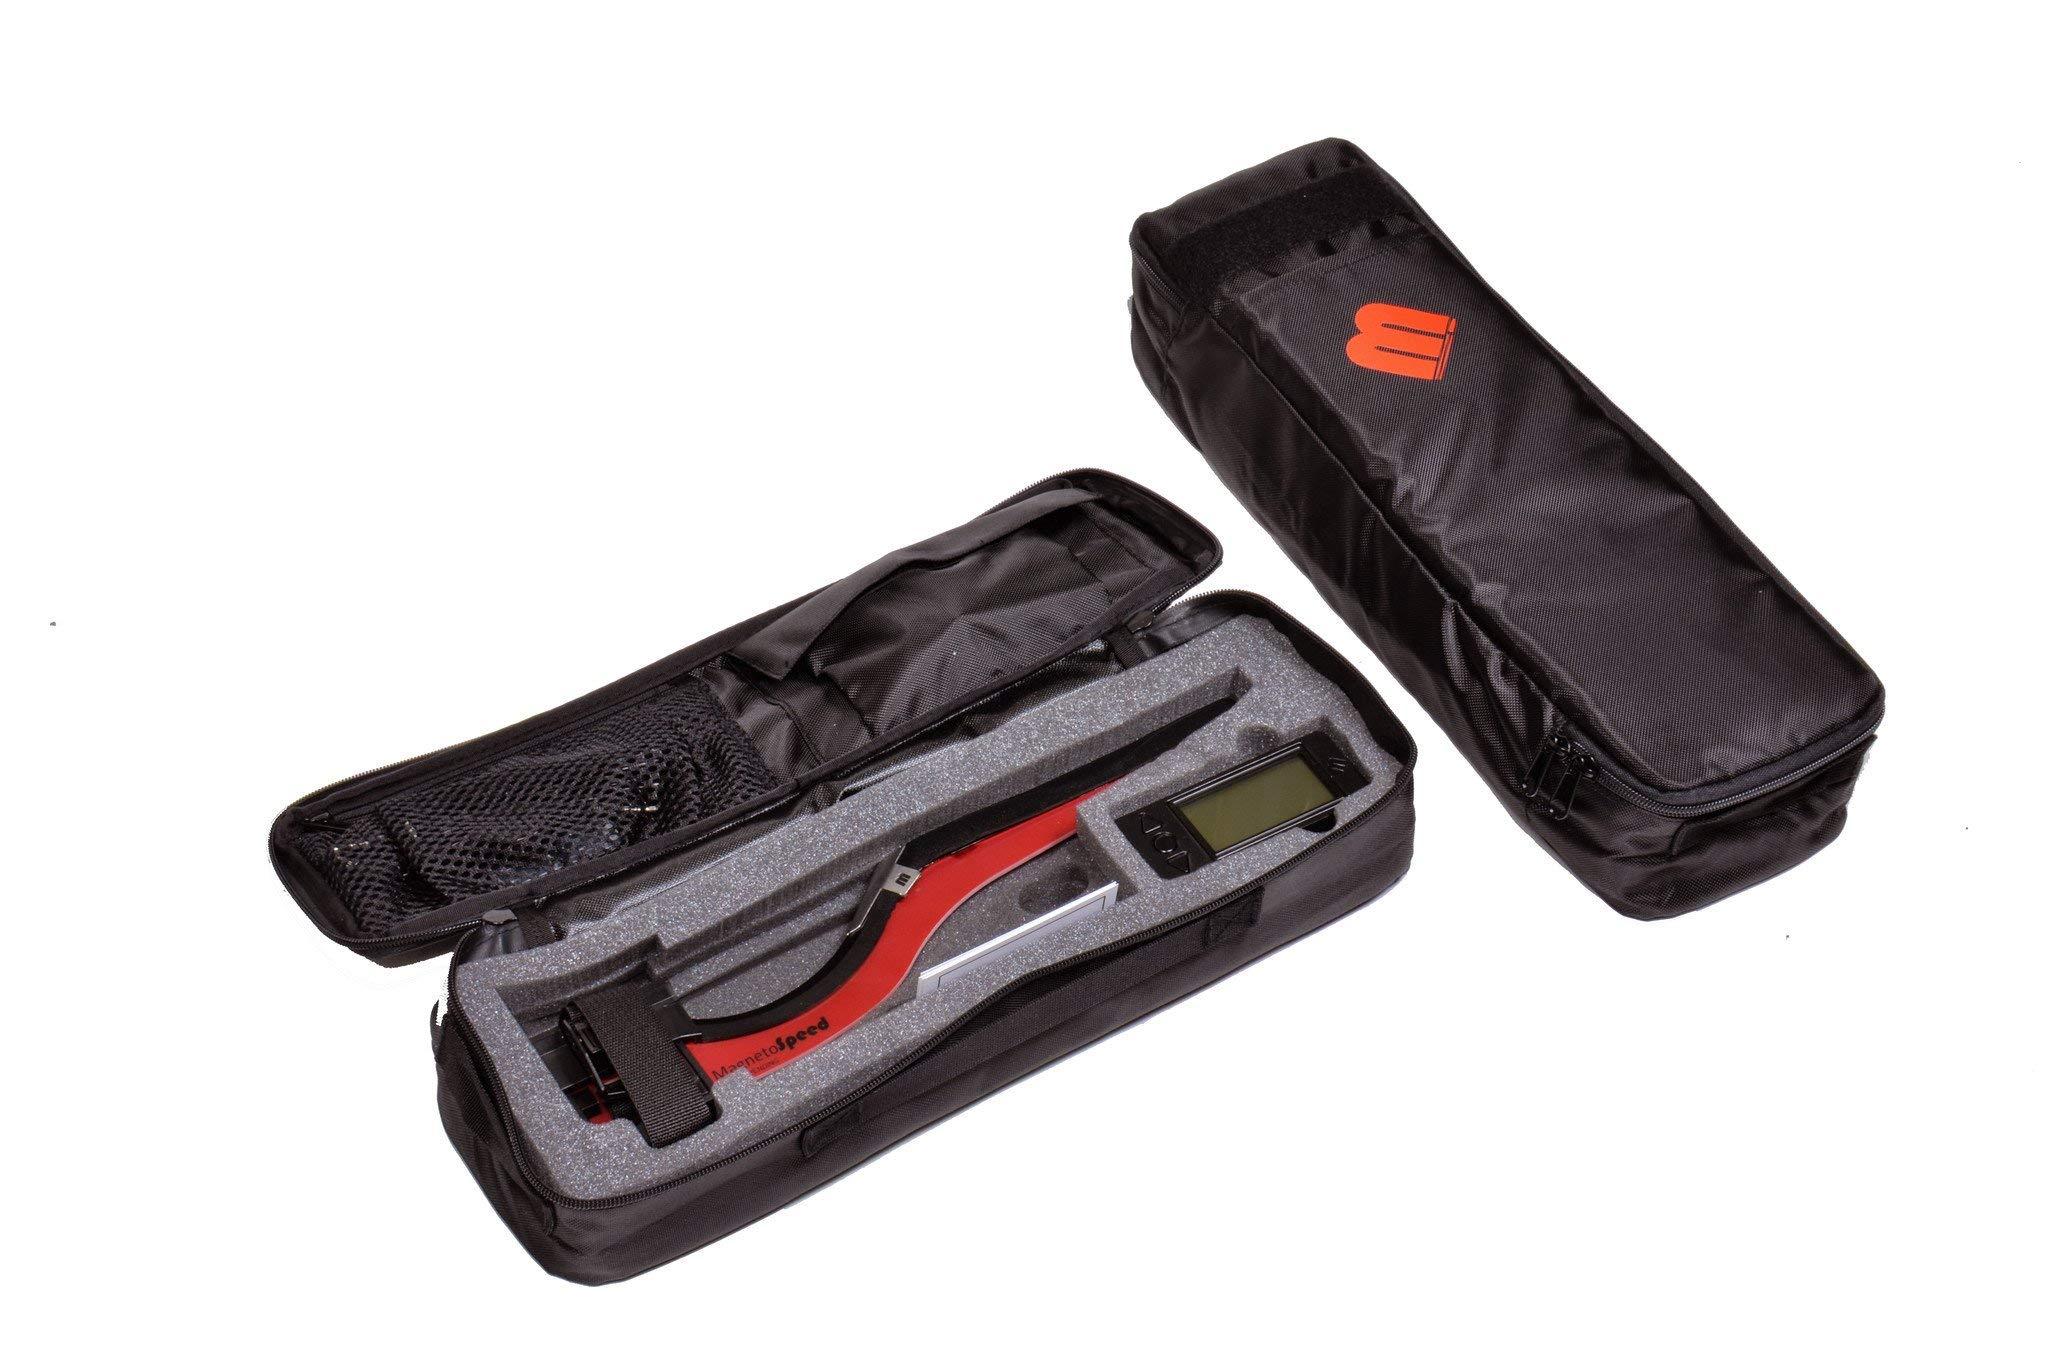 MagnetoSpeed V3 Barrel-Mounted Ballistics Chronograph Kit, Black, Softcase by MagnetoSpeed